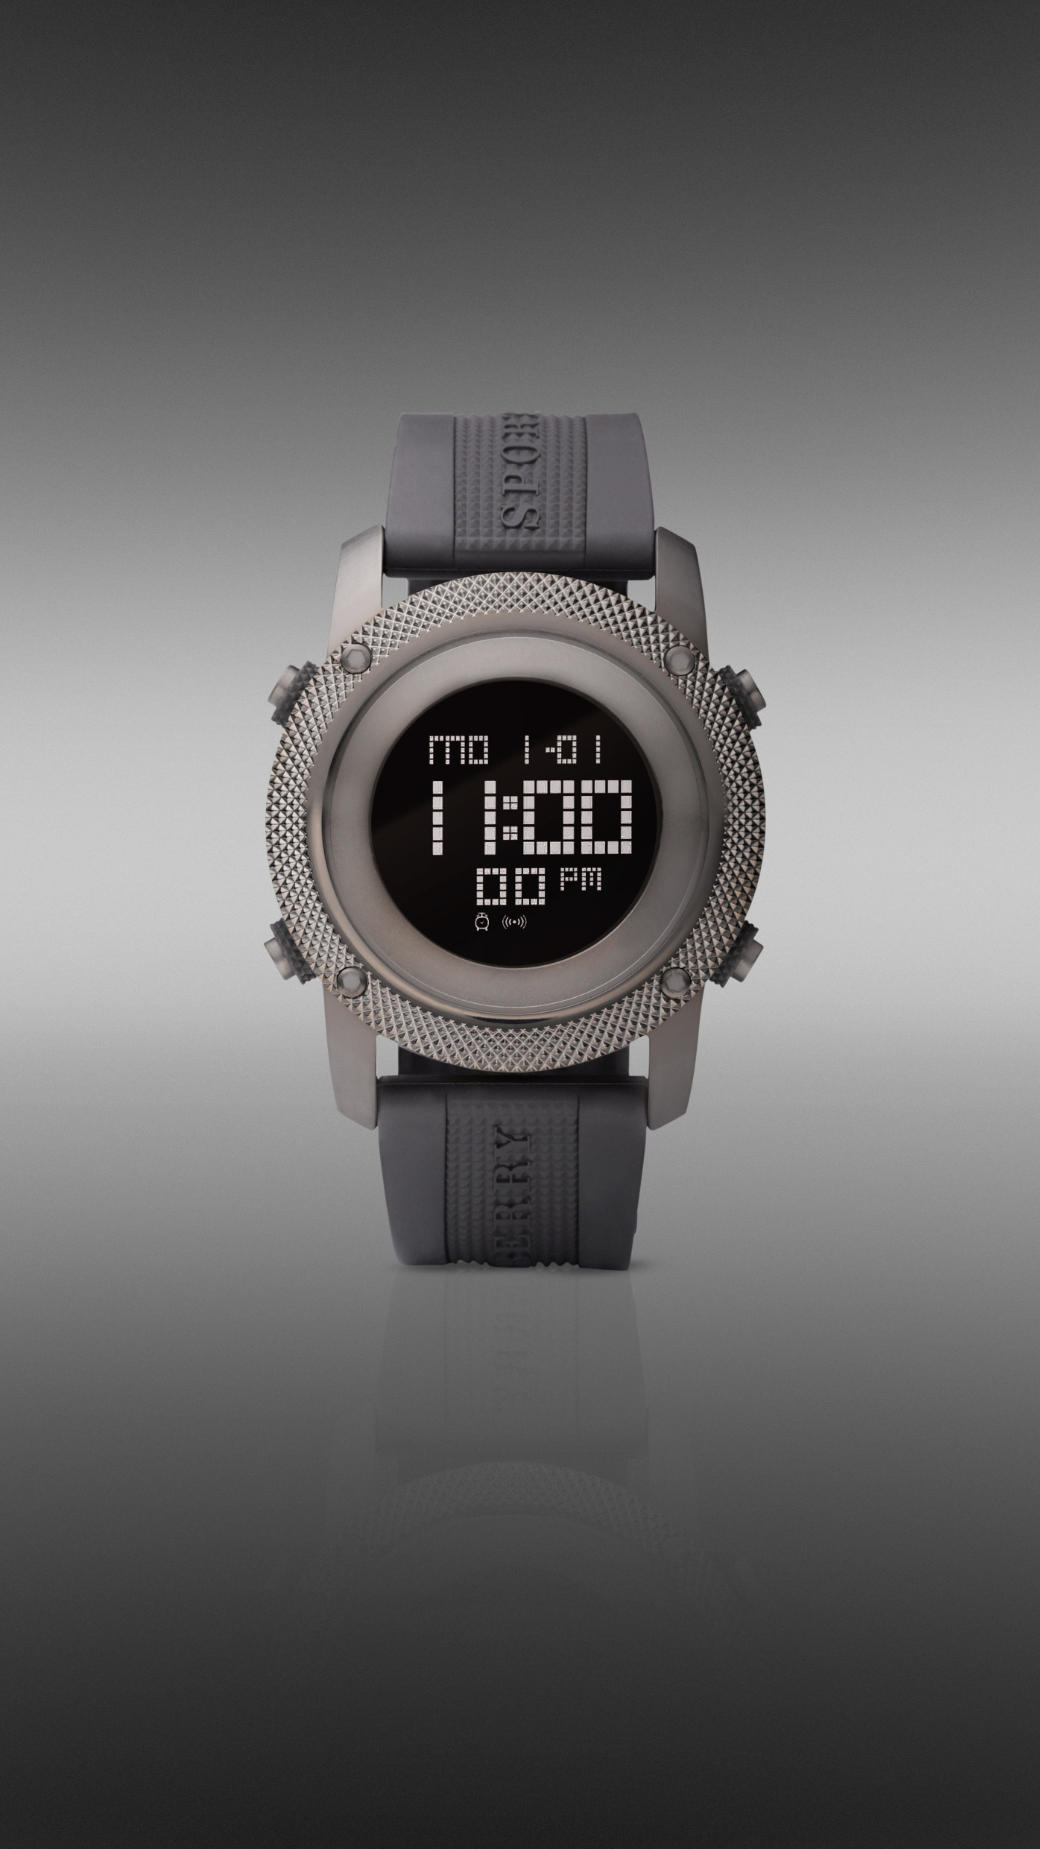 Burberry Digital Rubber Strap Watch | Nordstrom